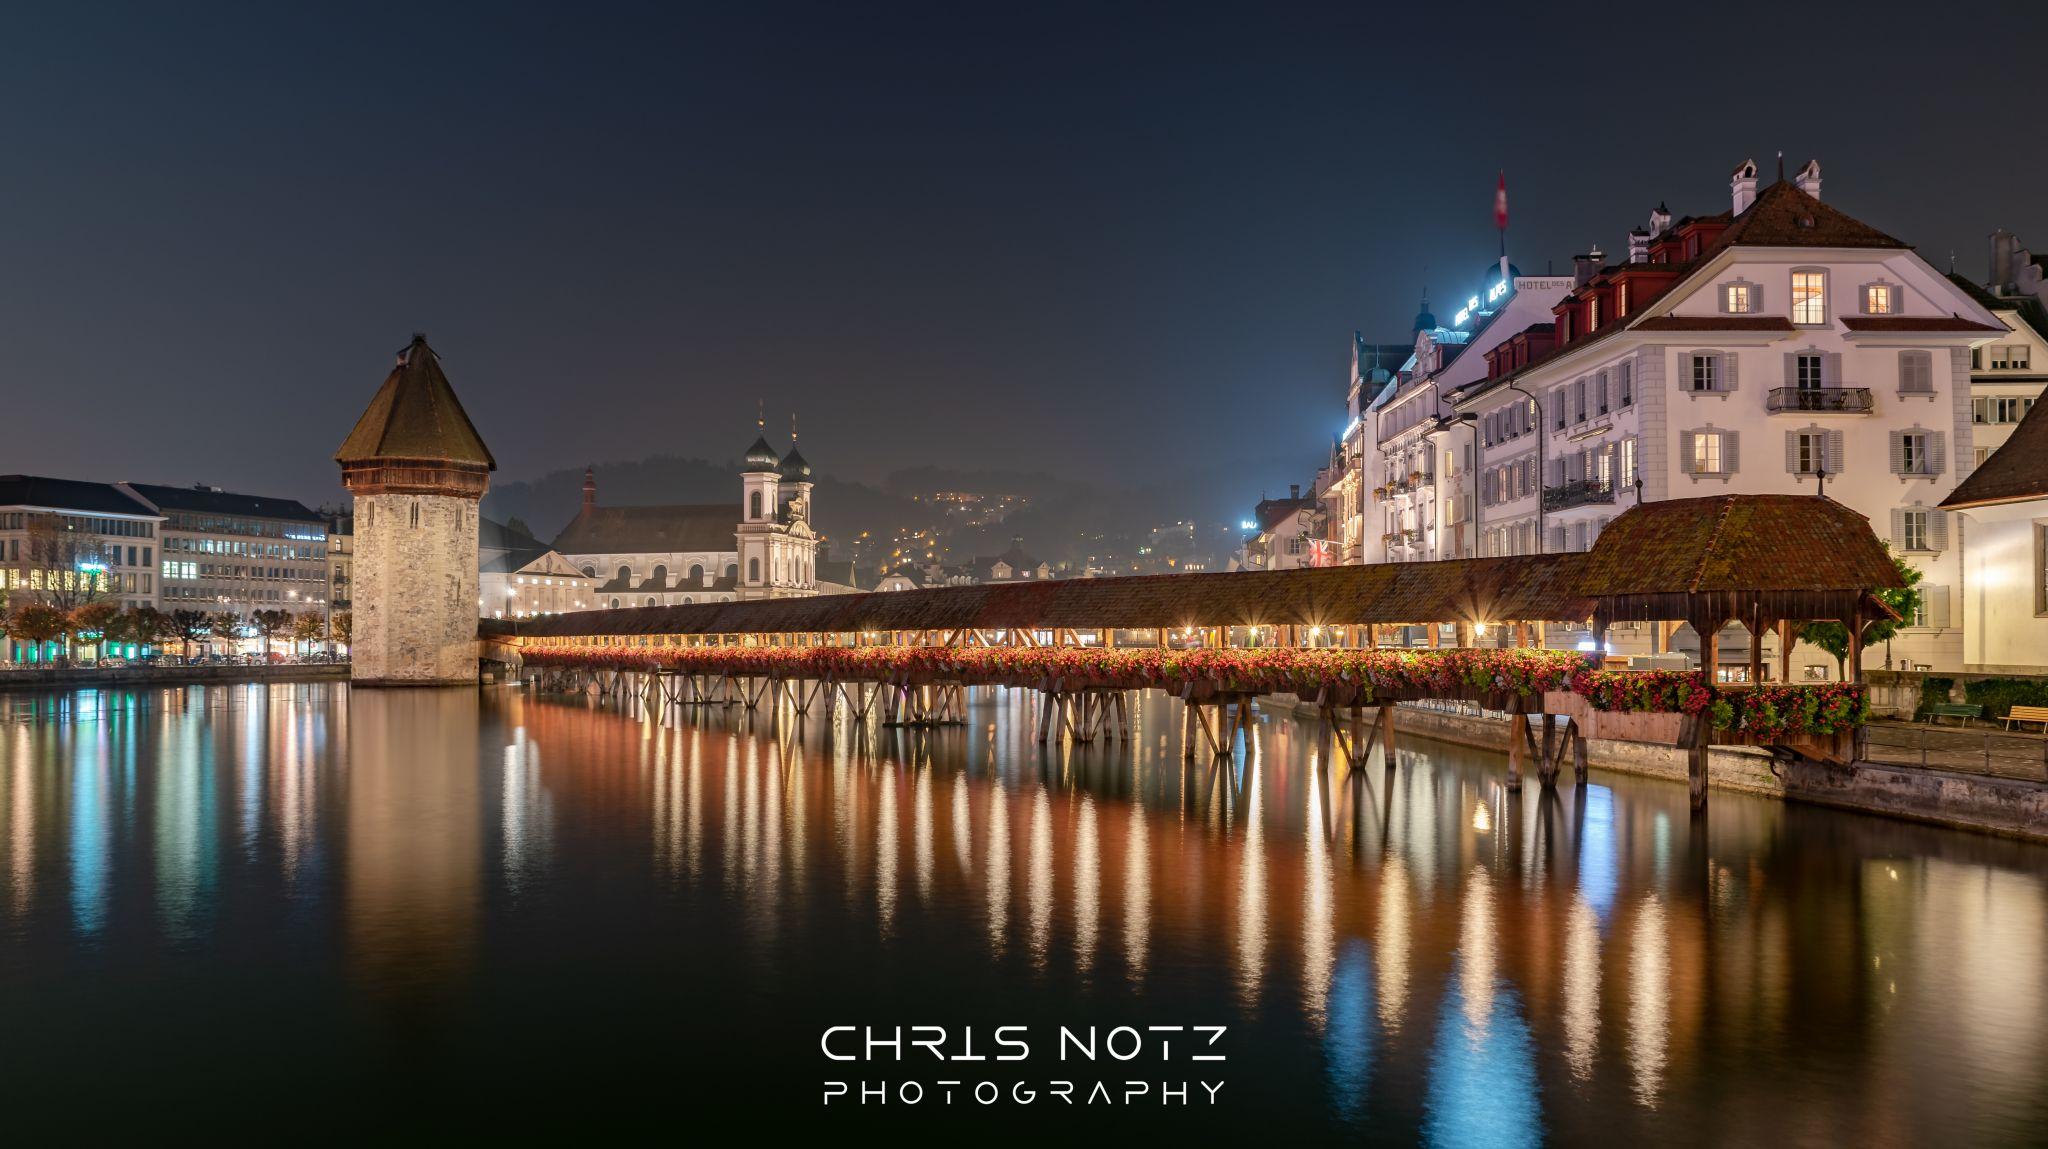 Kapellbrücke Luzern, Switzerland